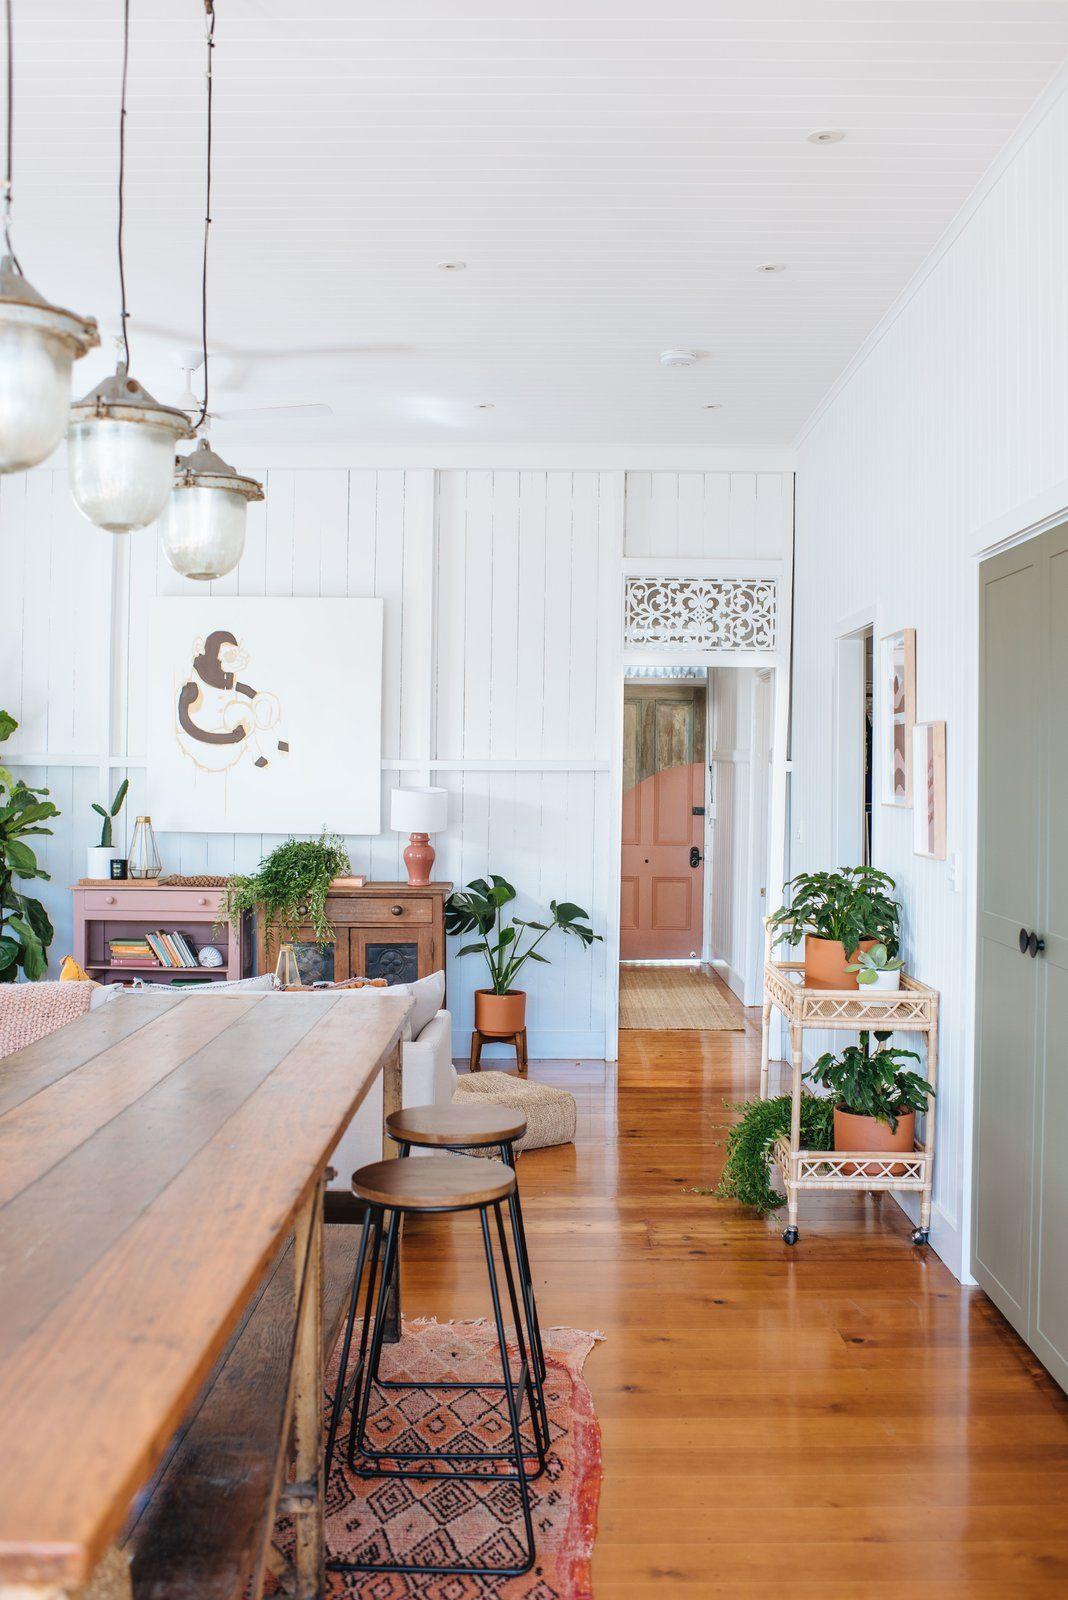 A Rundown Brisbane Cottage Turns Into a Ravishing, Modern